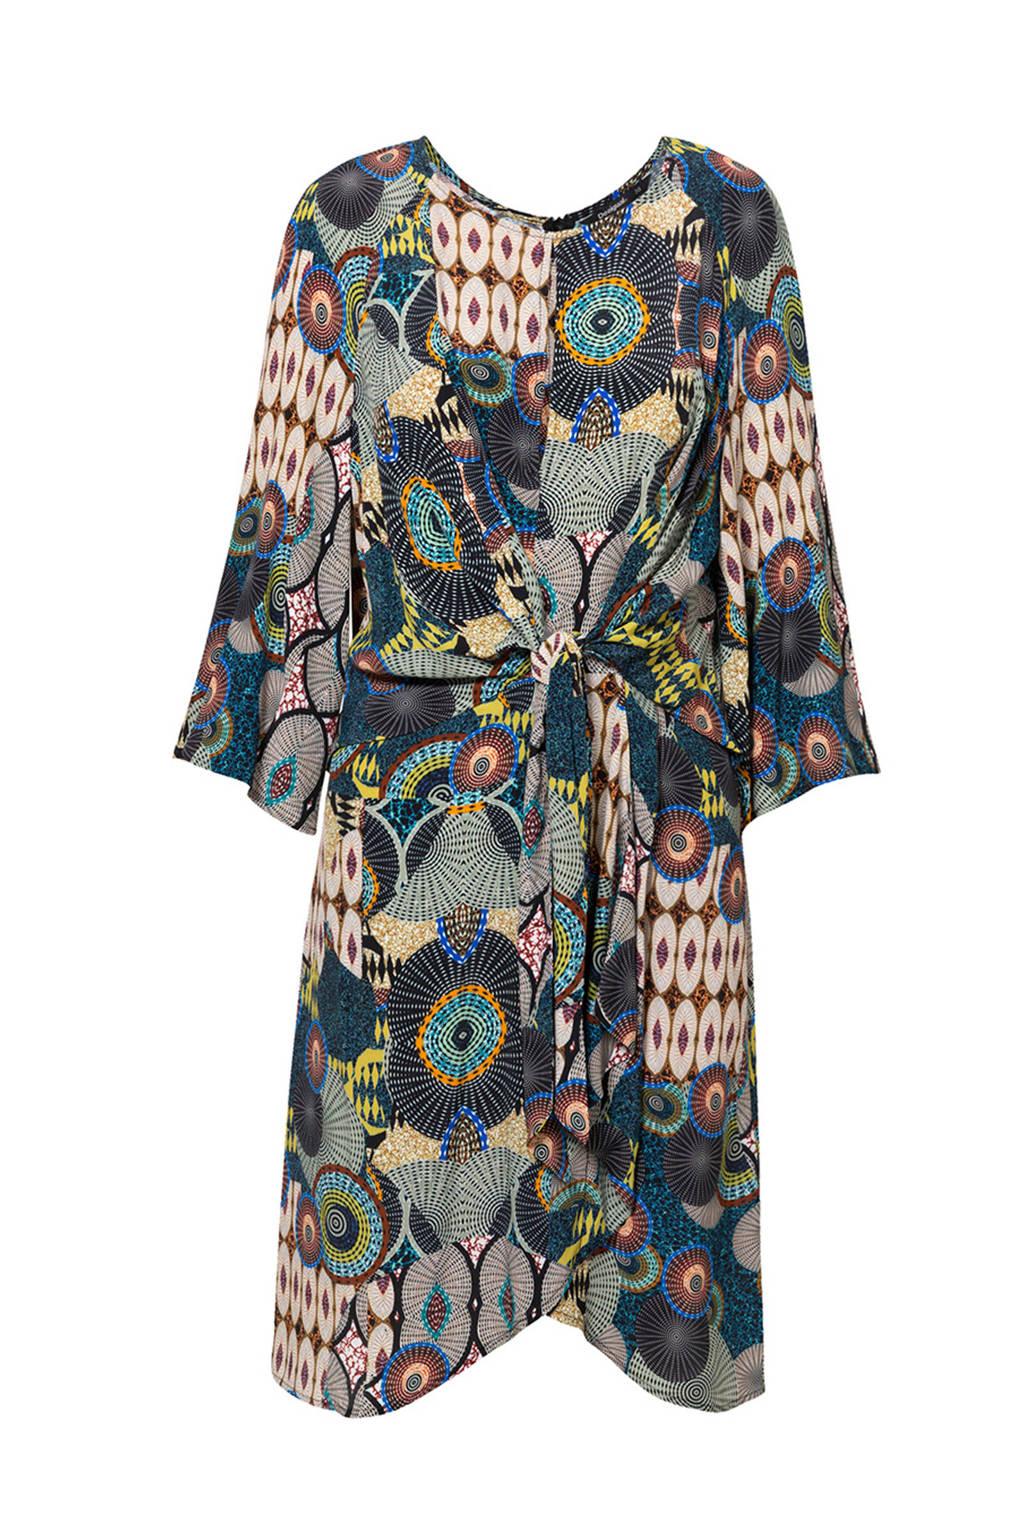 Desigual jurk met knoopdetail, Blauw/bruin/beige